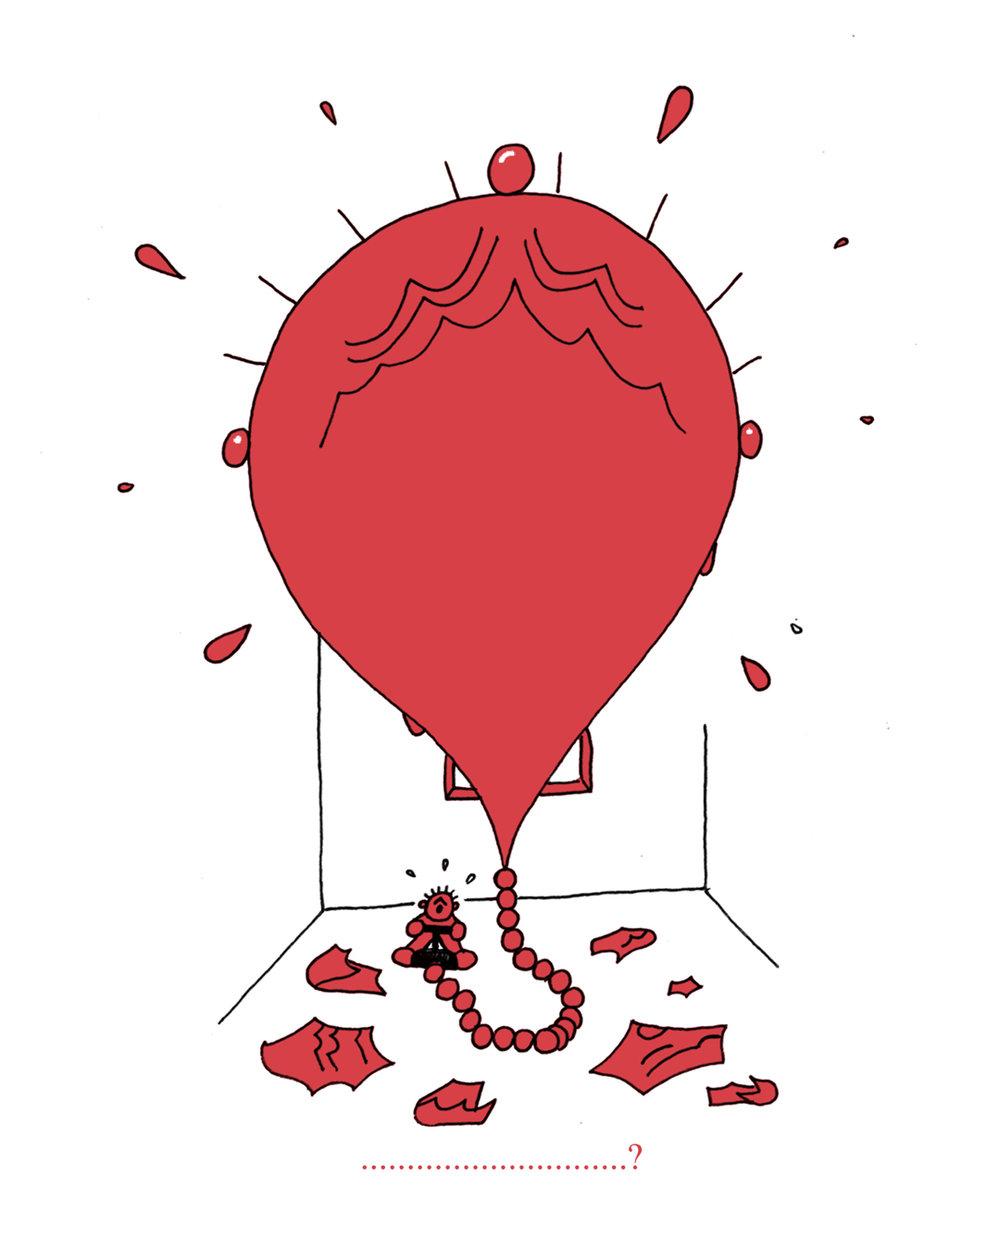 Ego Balloon, personal (2018)